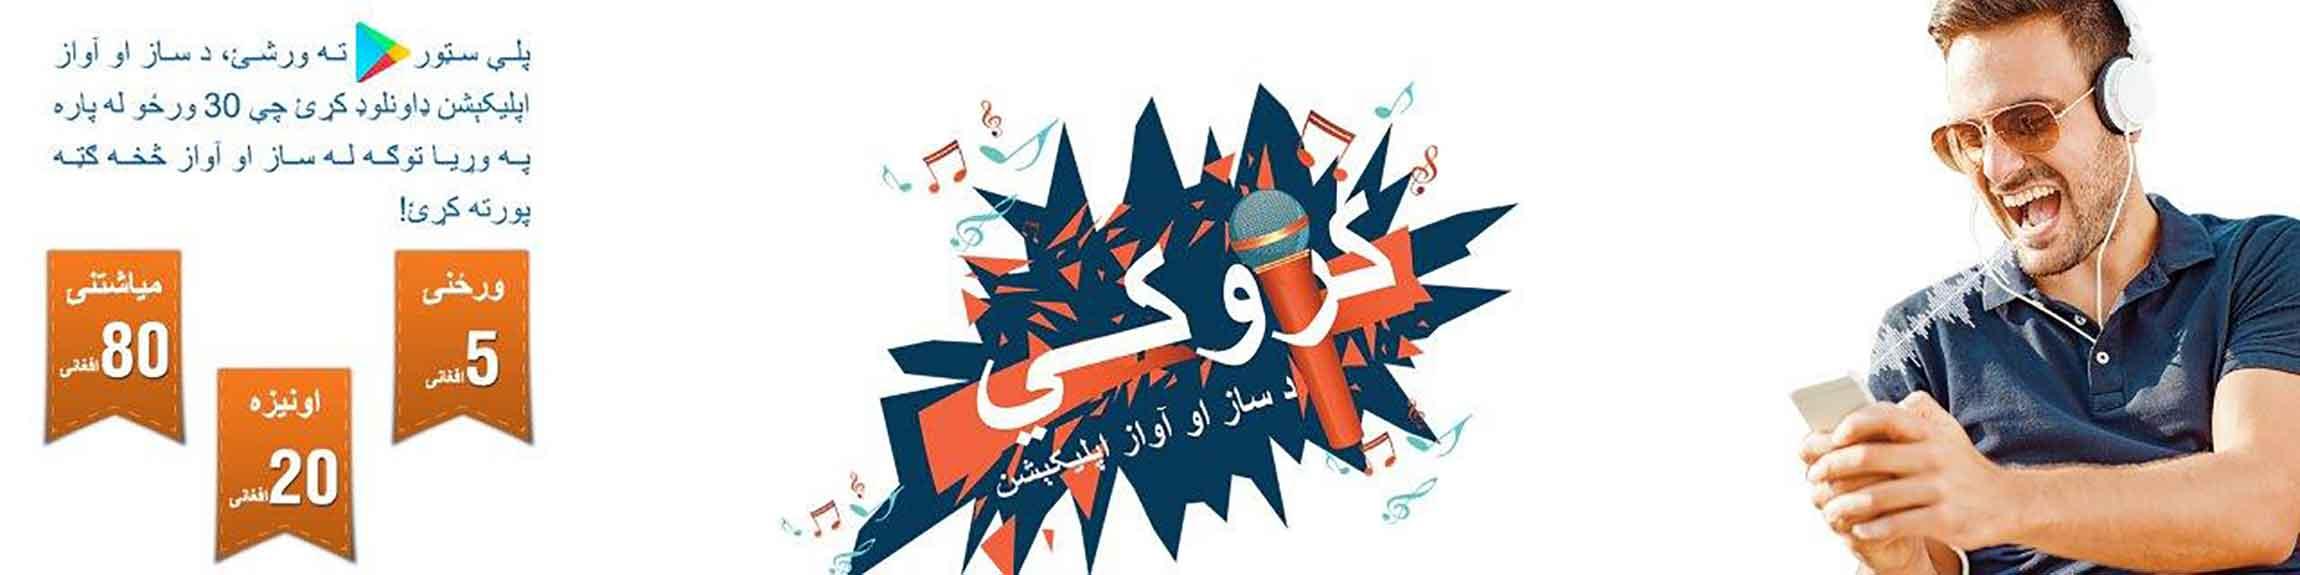 karoake-design-For-Web-Pashto